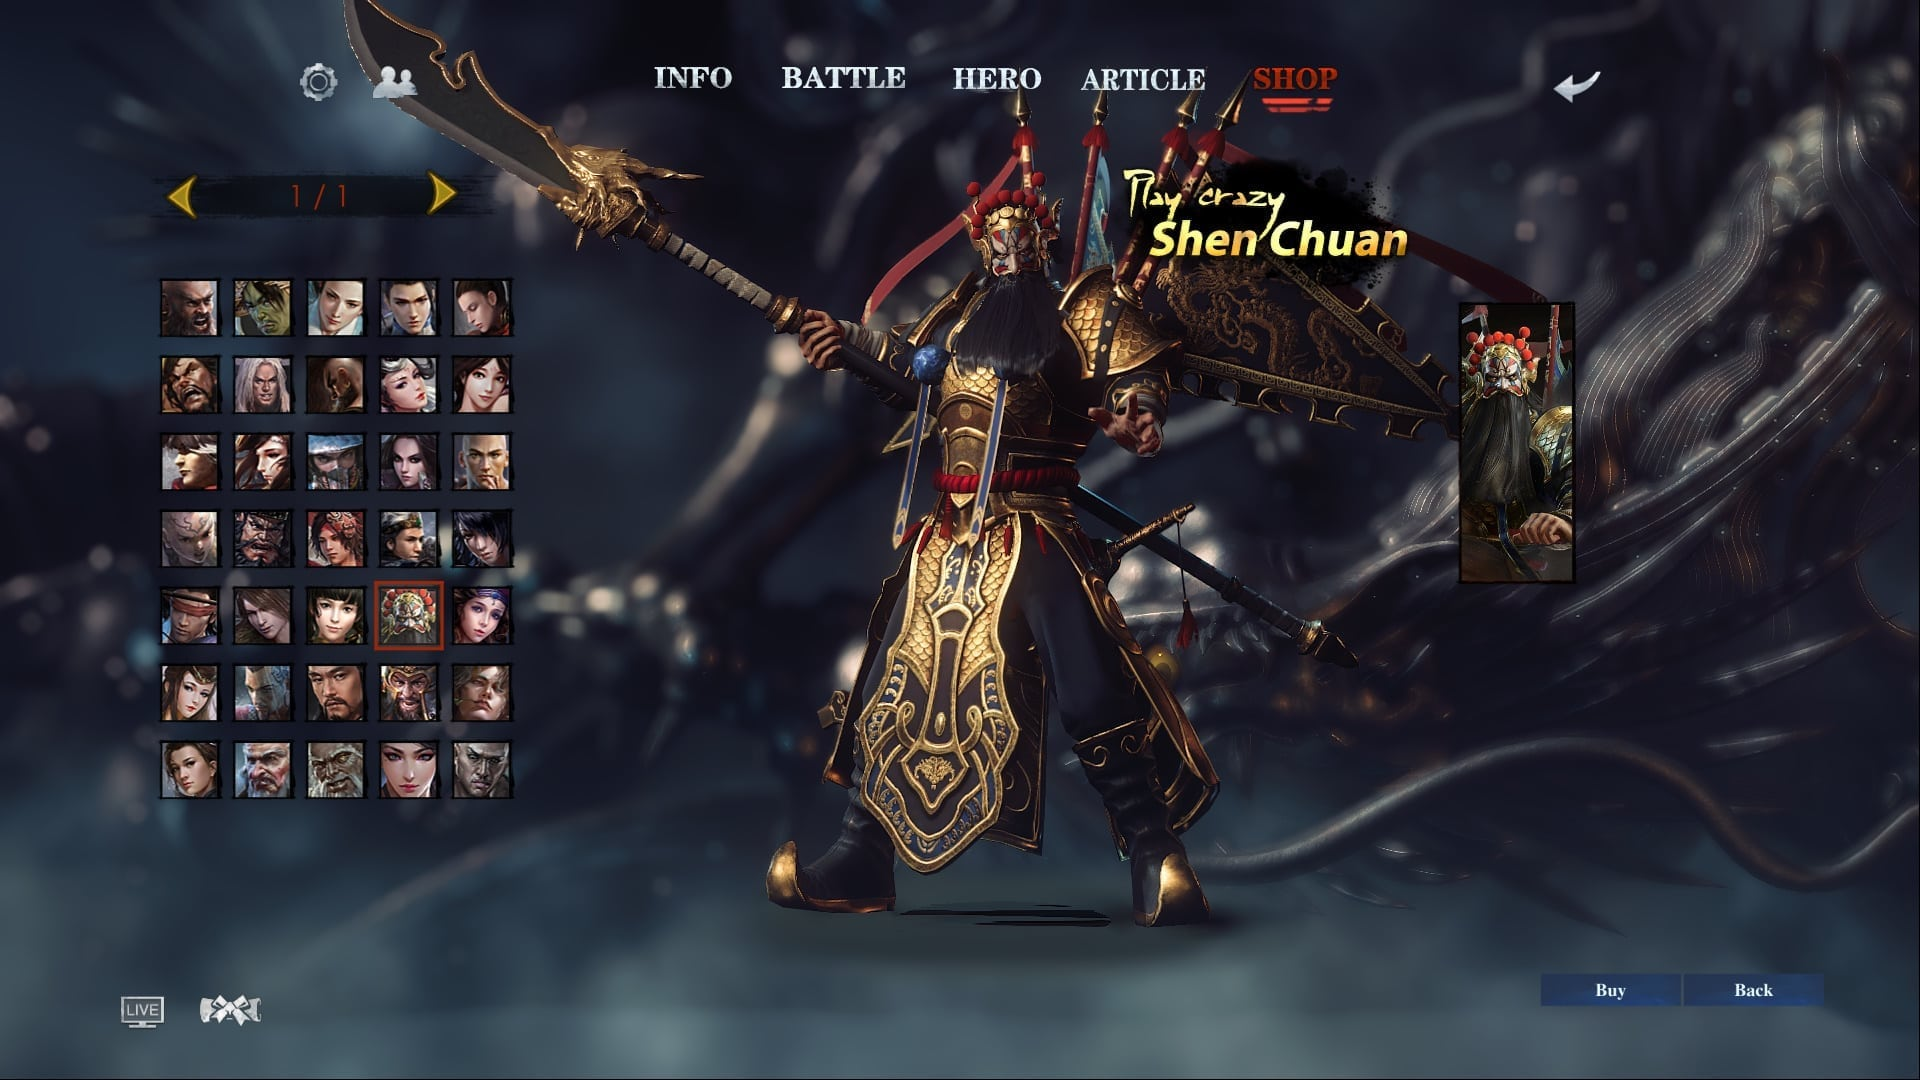 King of Wushu character list